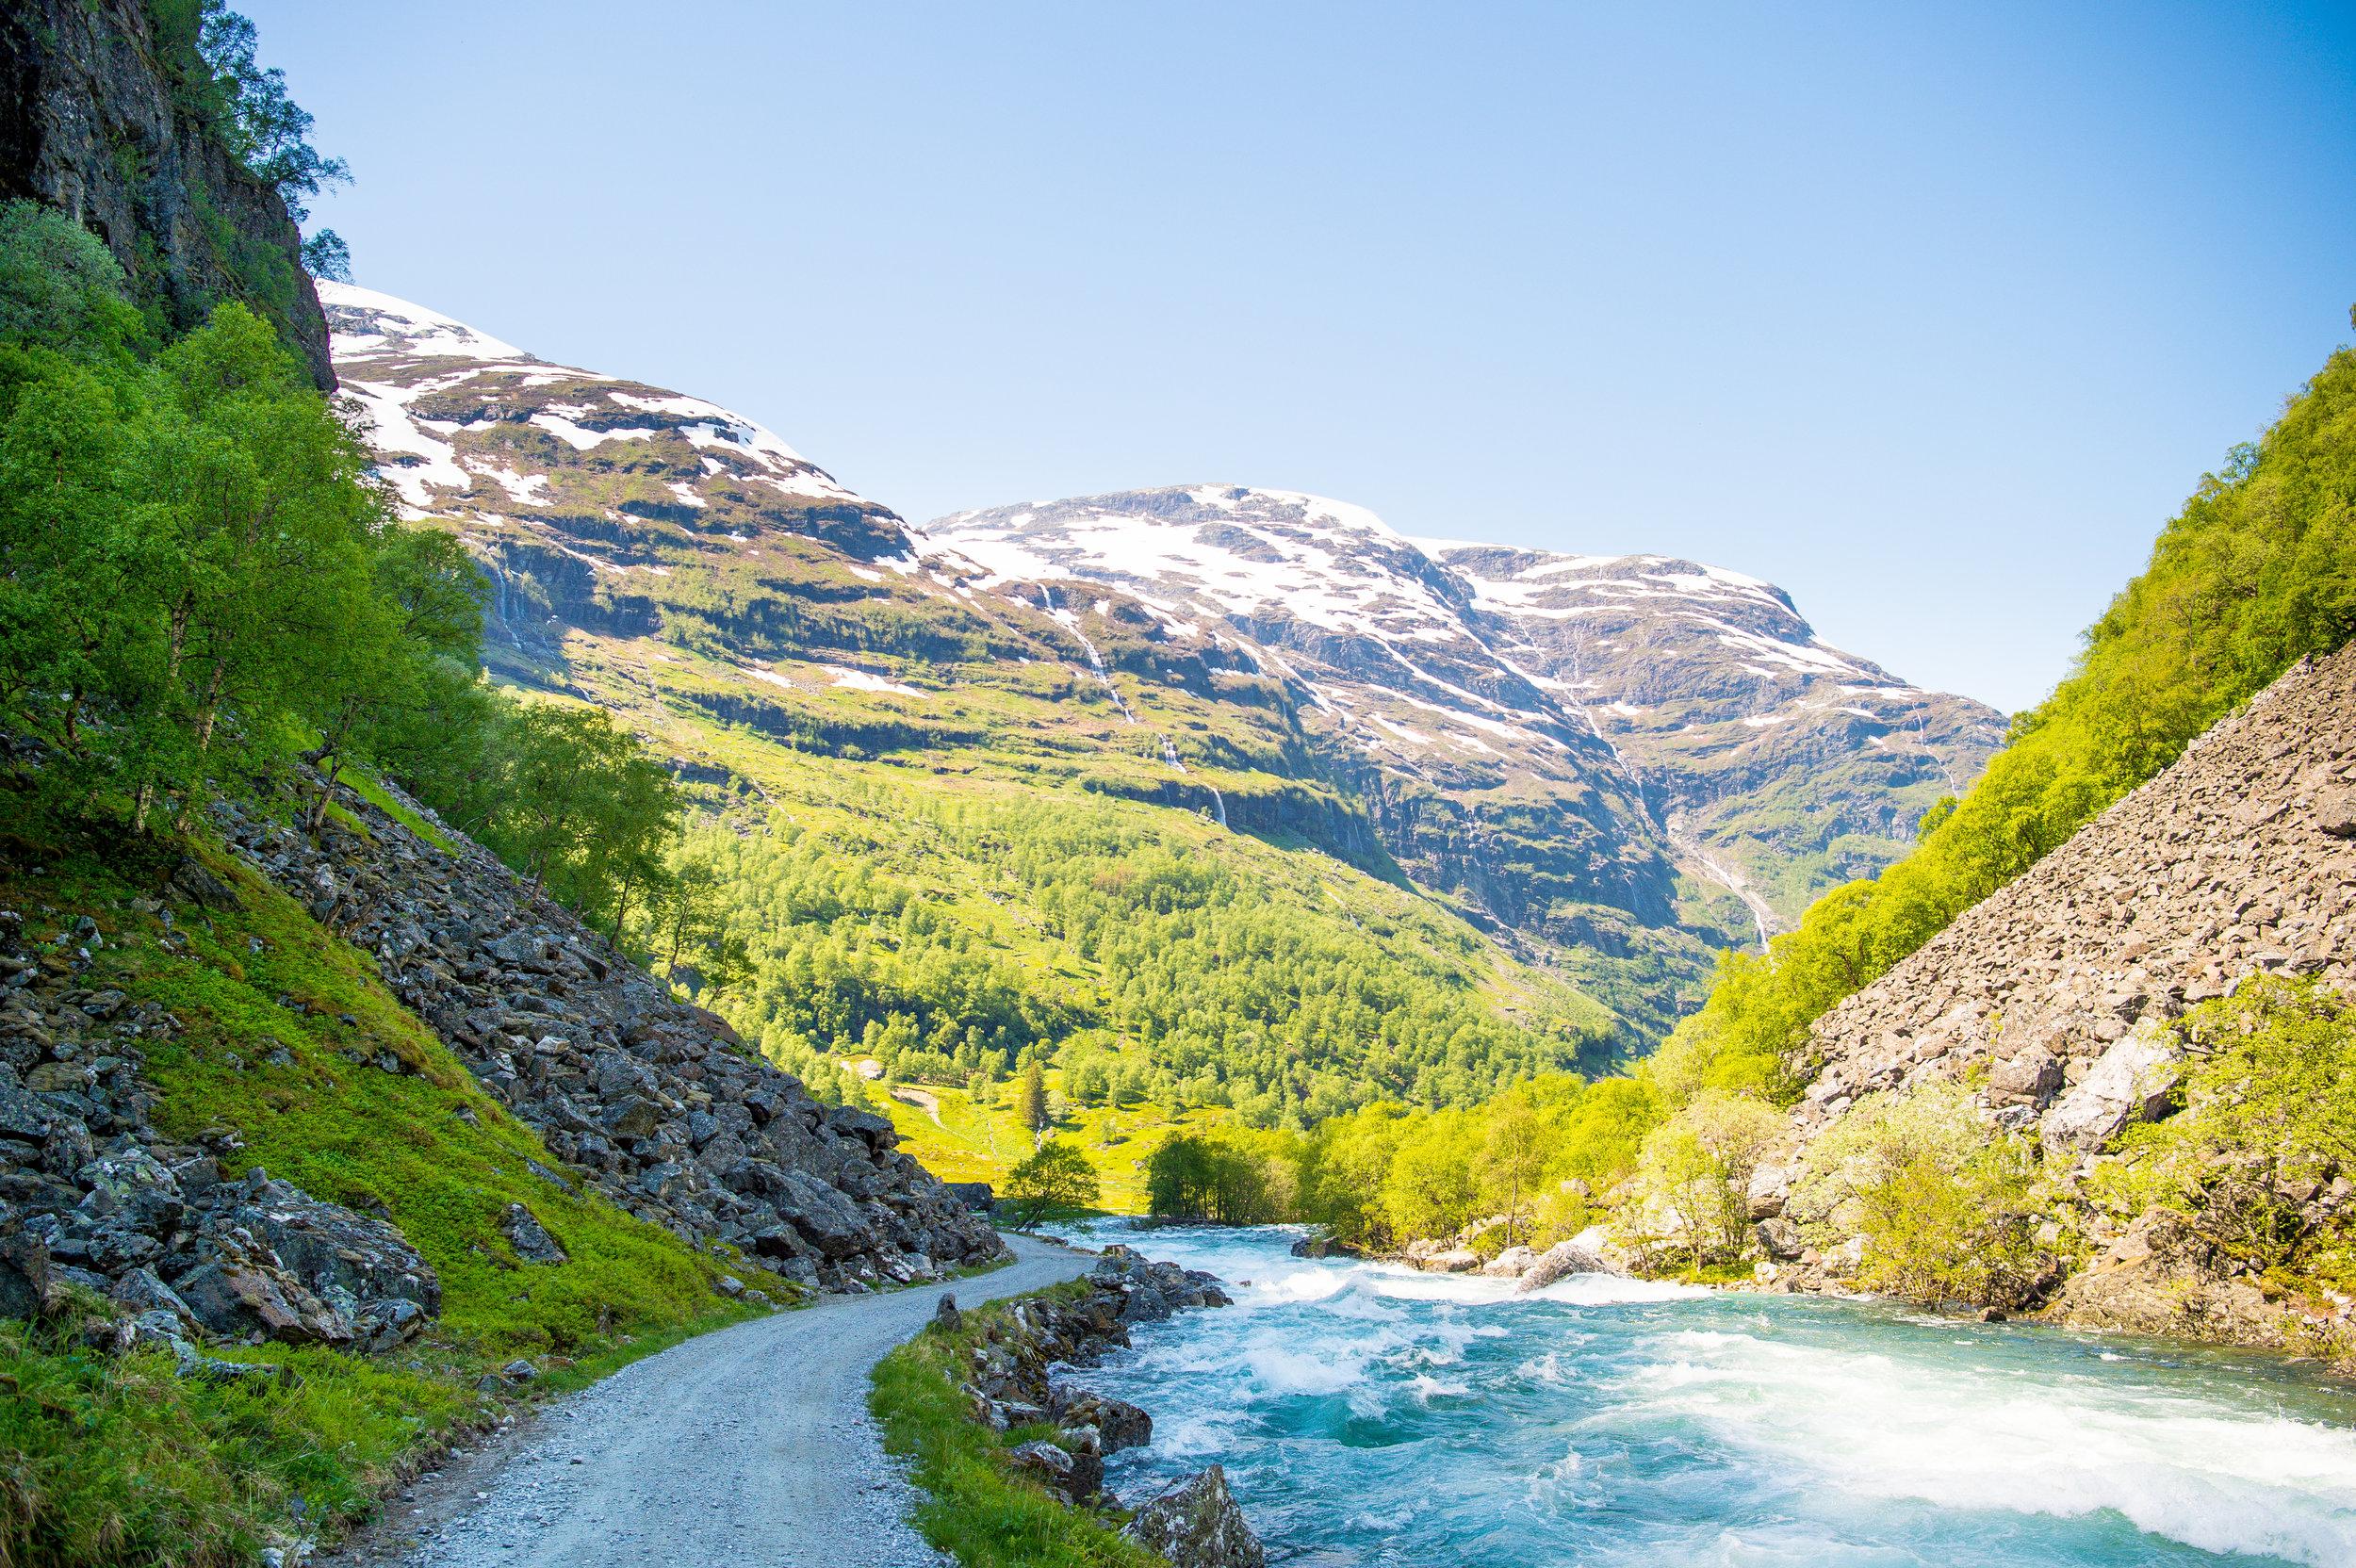 Flamsdalen-sverrehjornevik com Flåm AS ORG.JPG